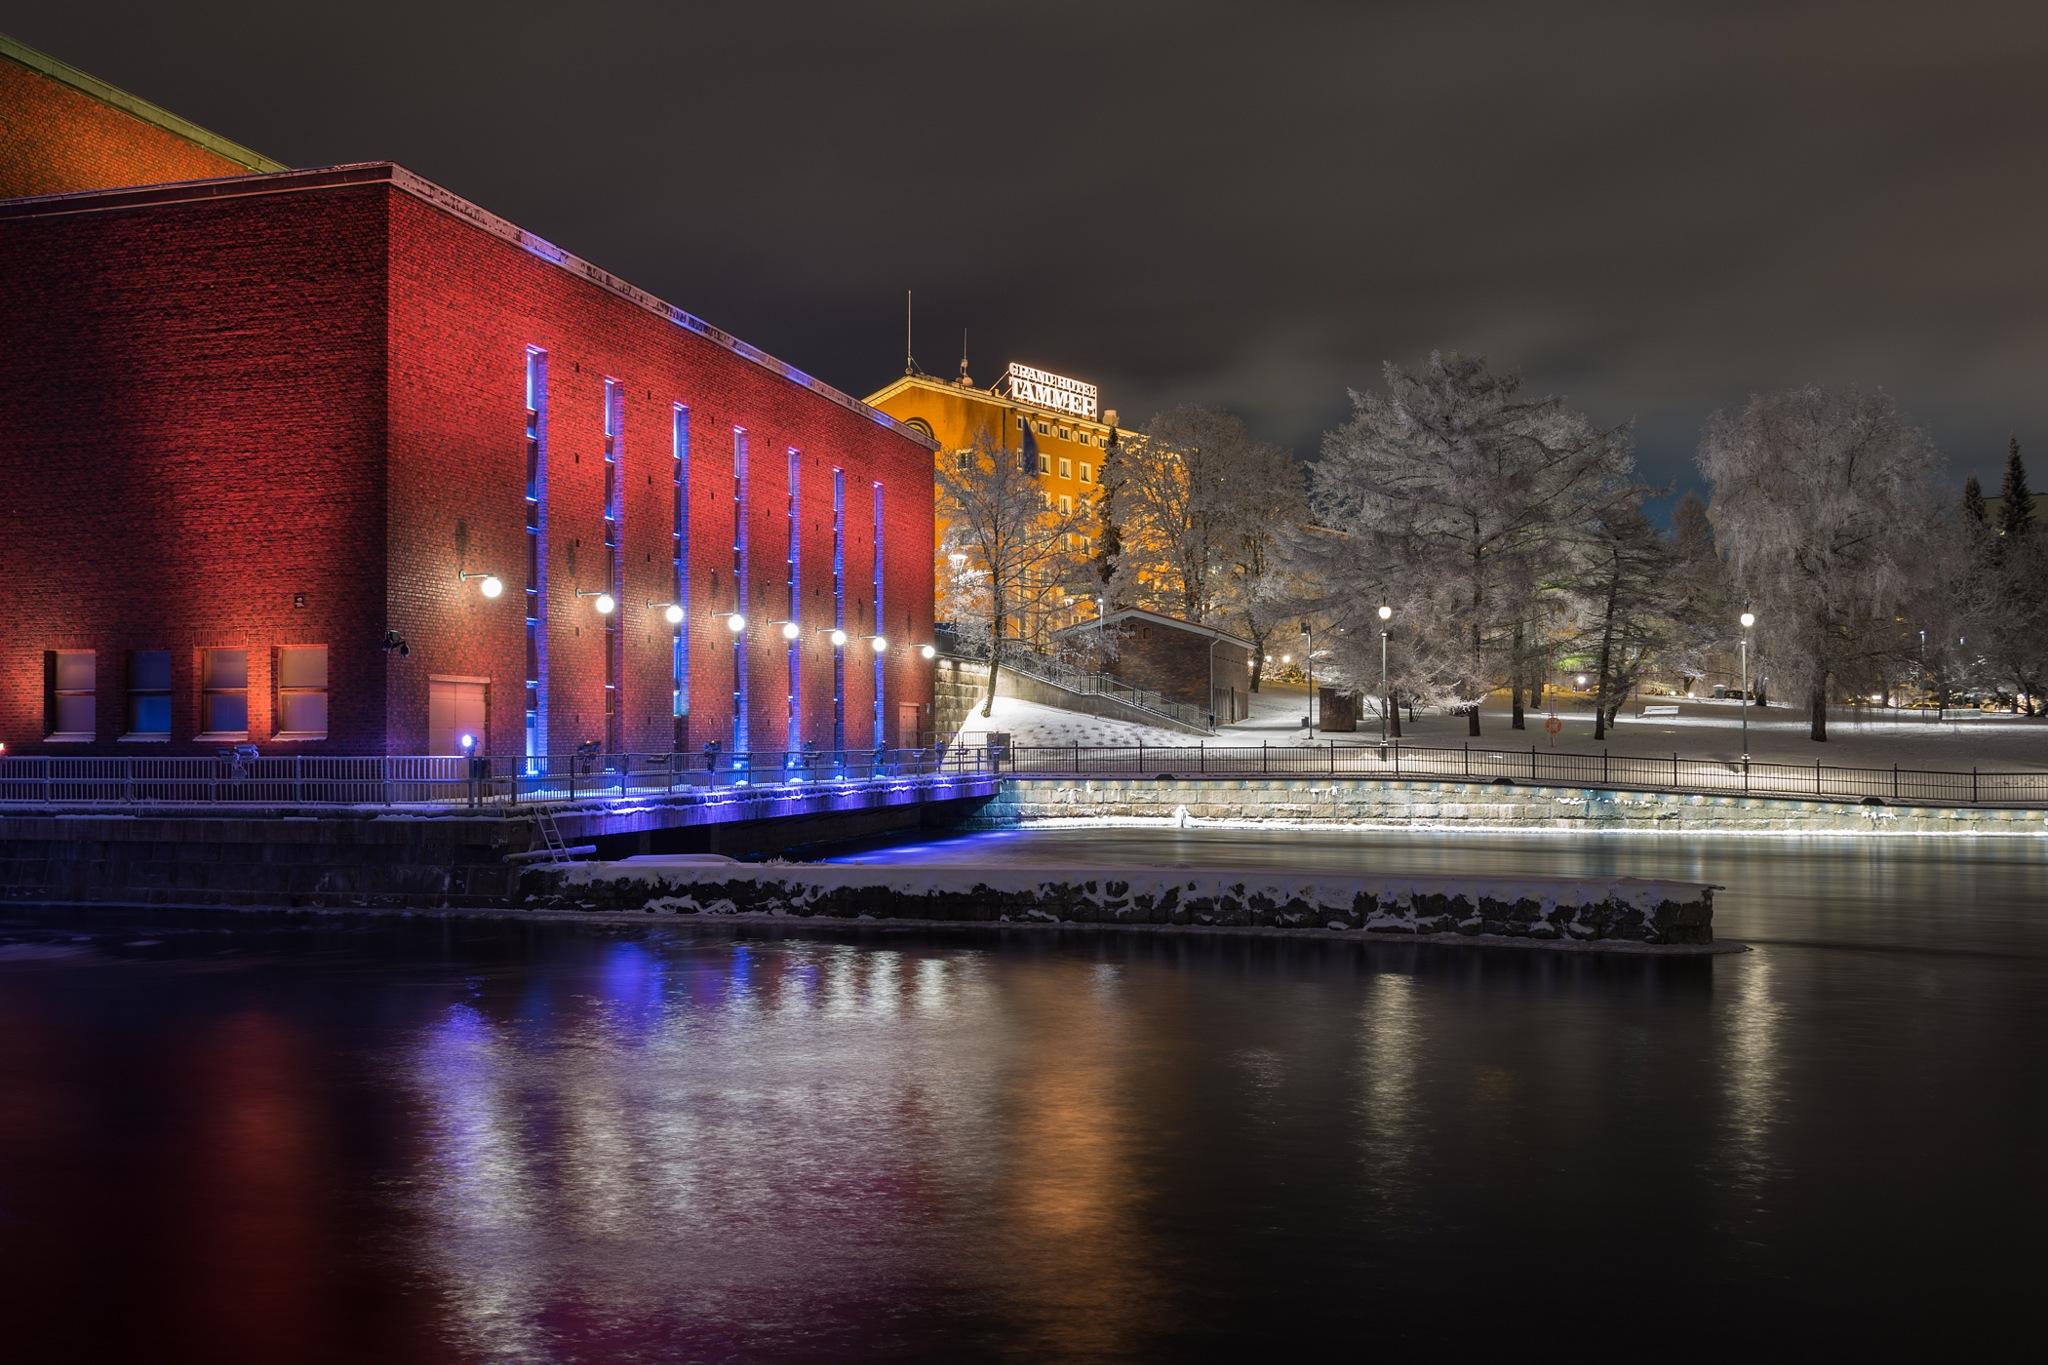 Tammerkoski Power Plant and Grand Hotel Tammer by Petri Pihlaja